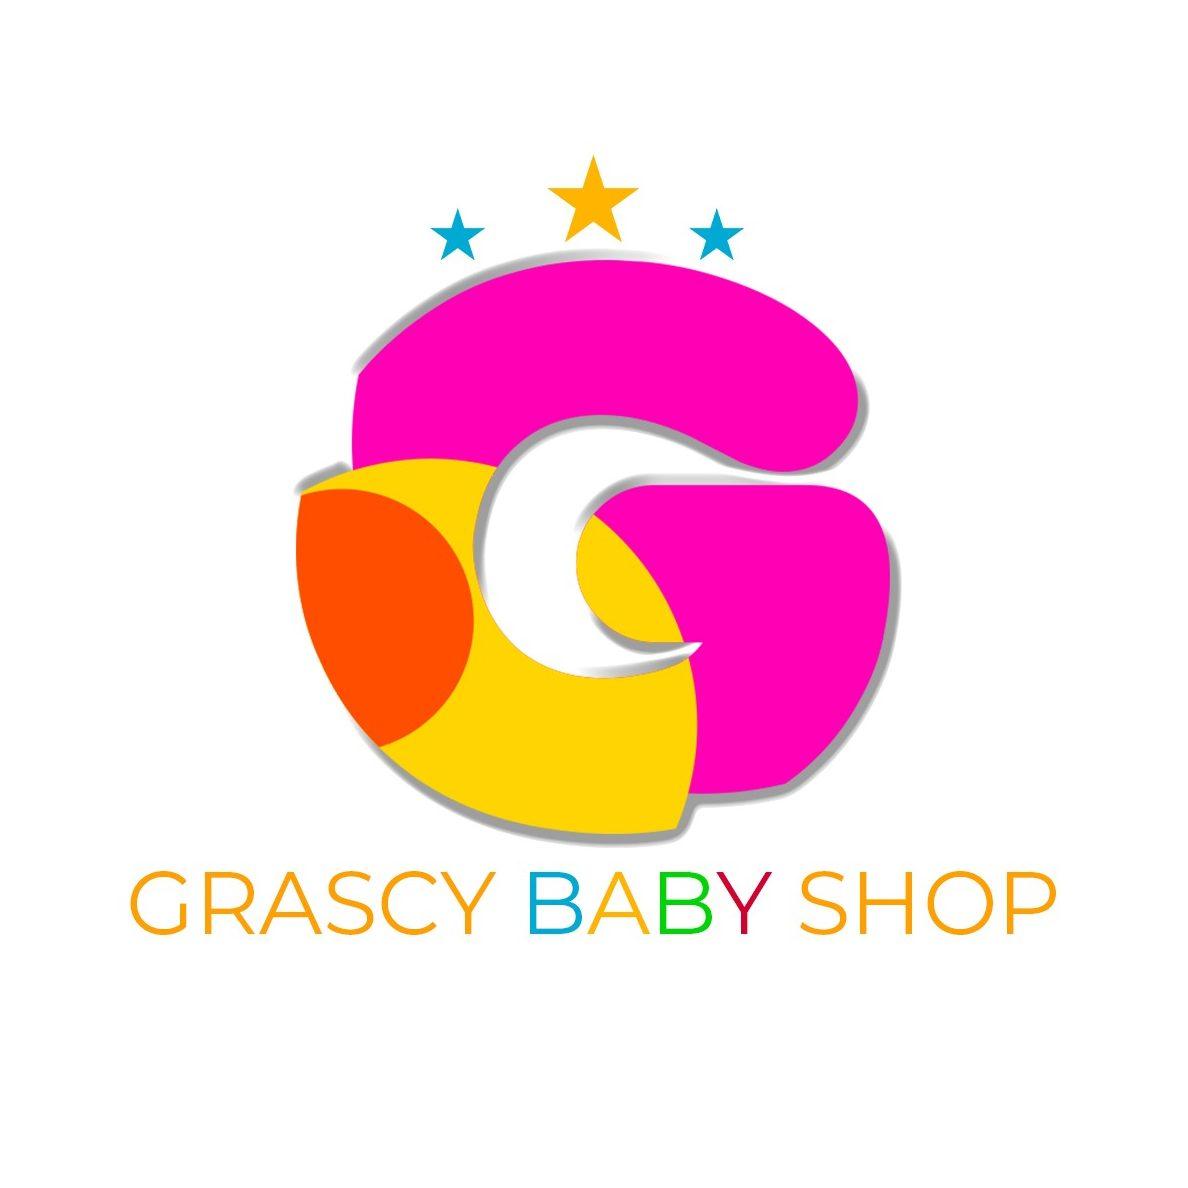 Grascy Baby Shop